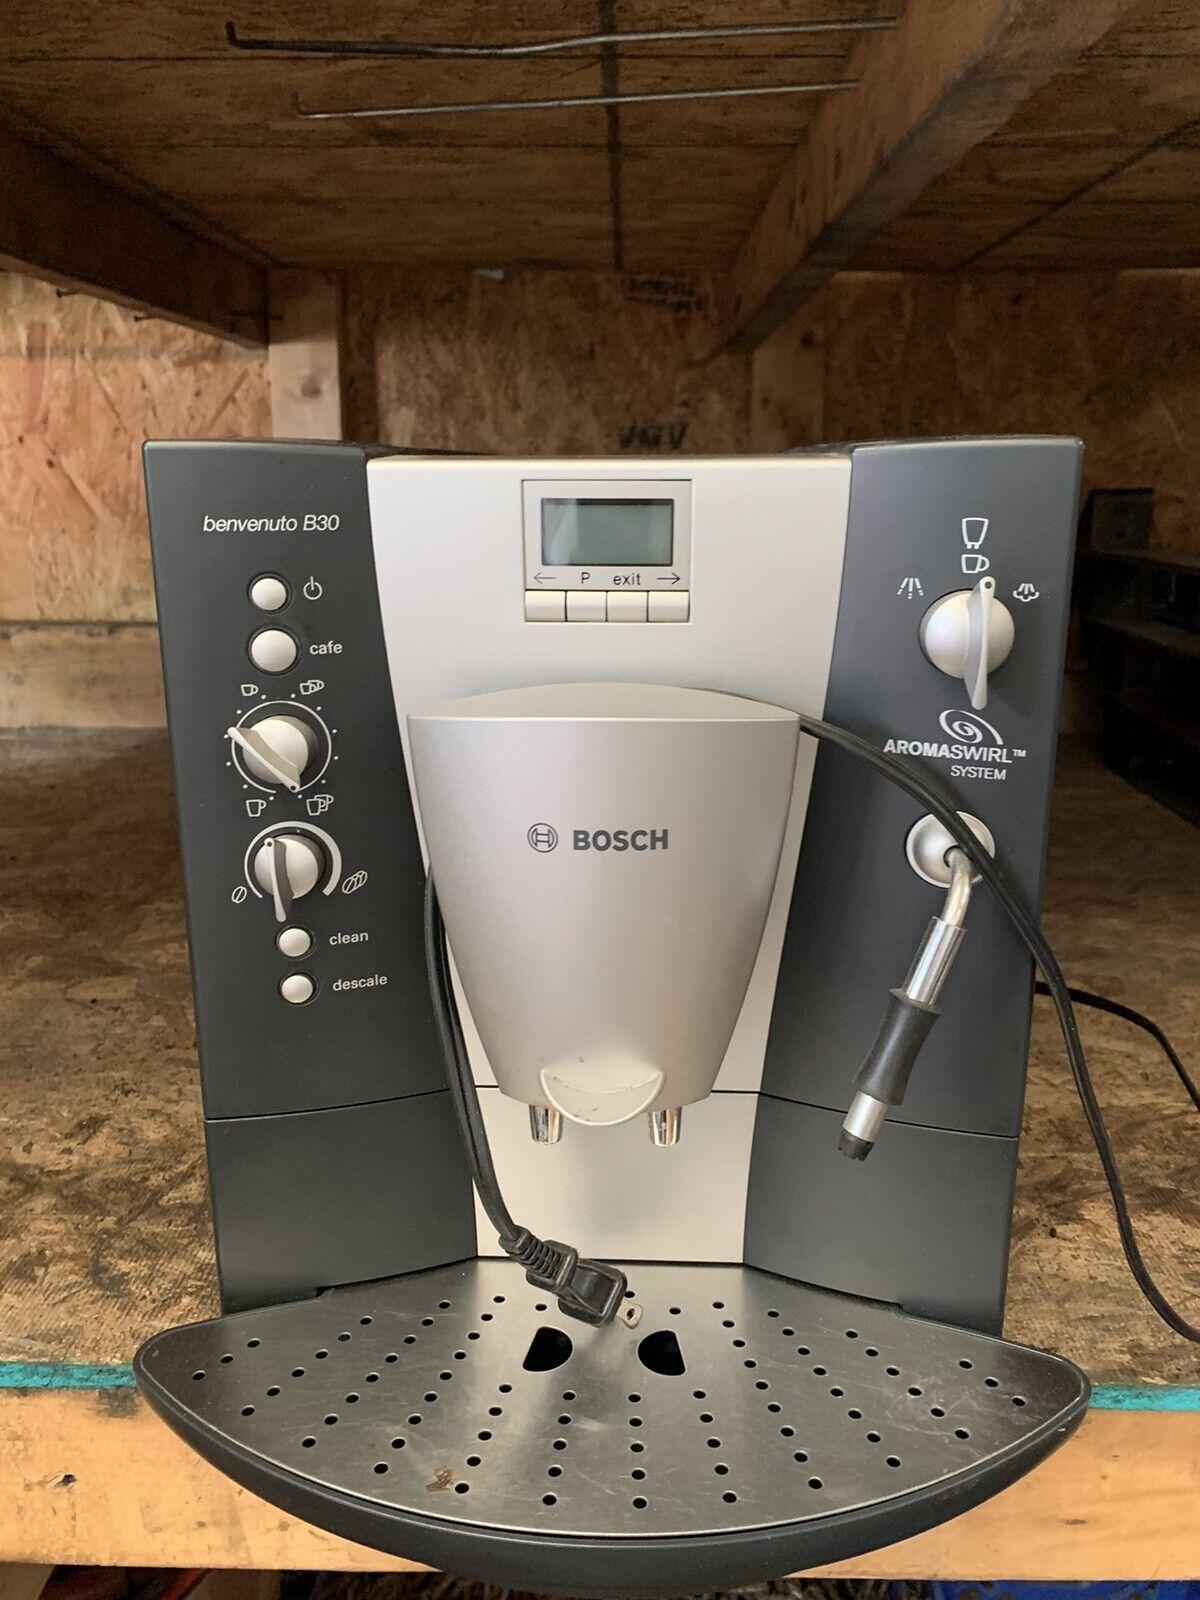 3 Water Filter Cartridge for Bosch Siemens B20 Coffee Machine